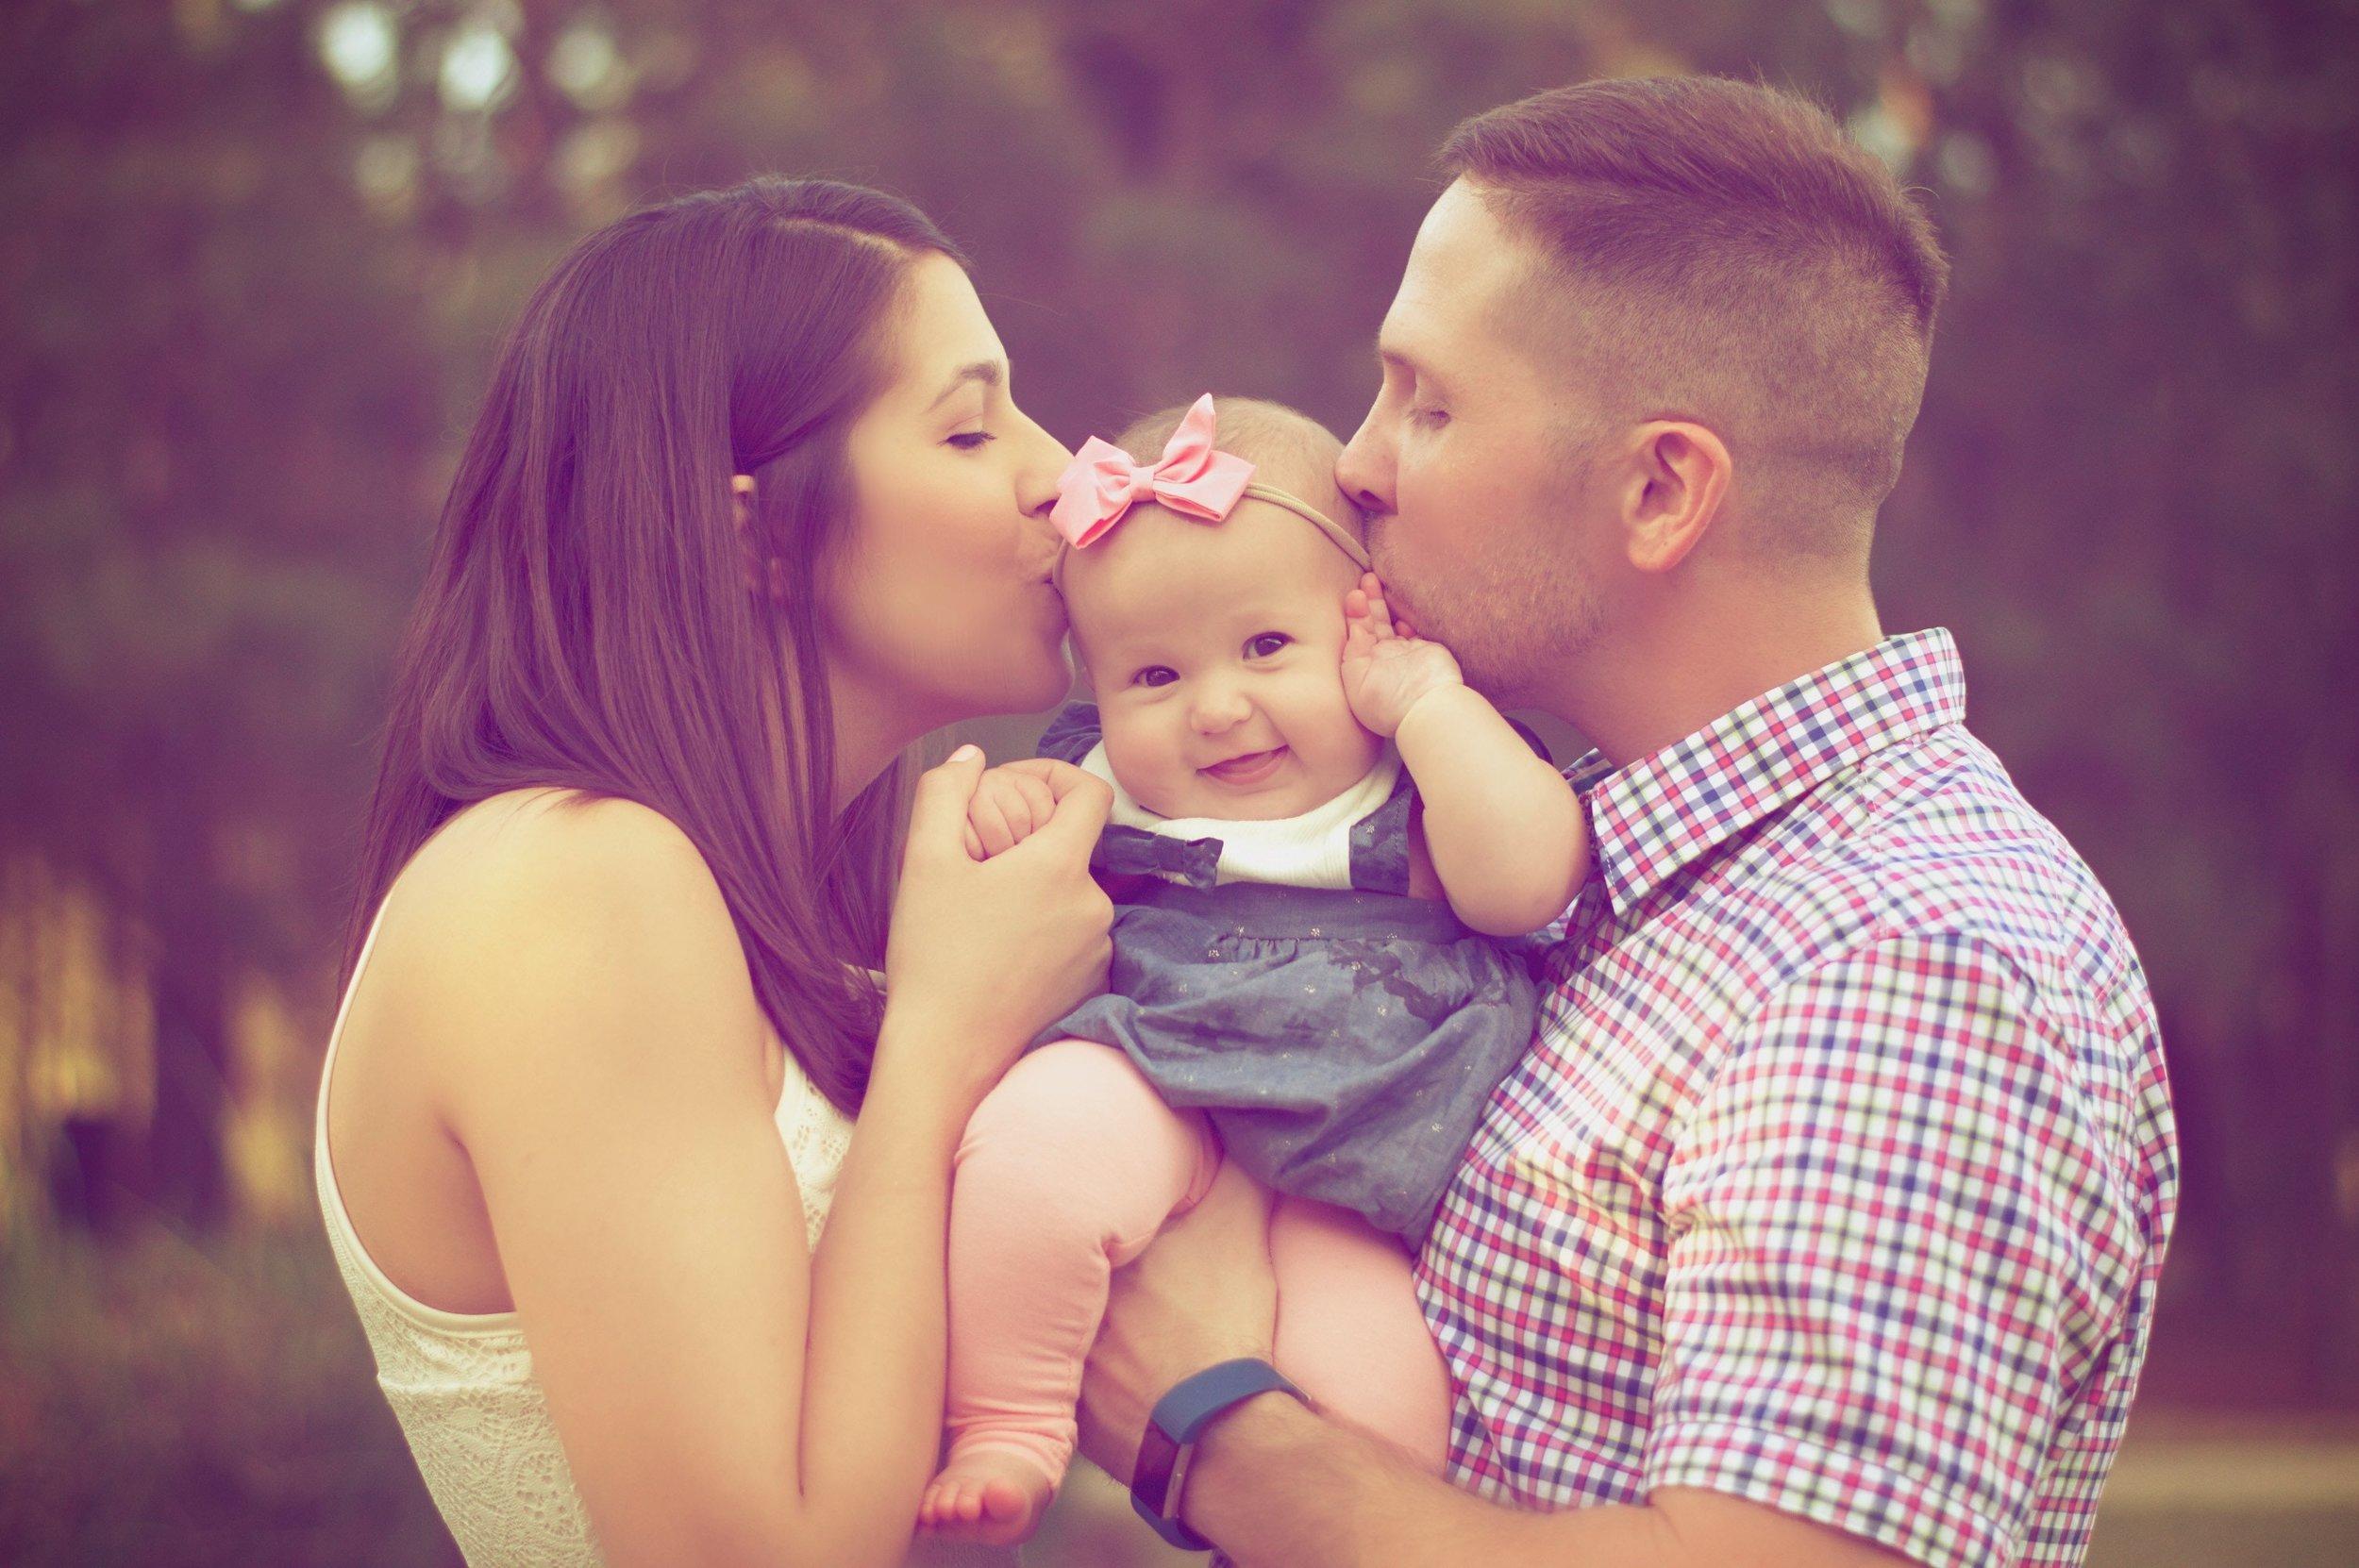 affection-baby-baby-girl-377058.jpg